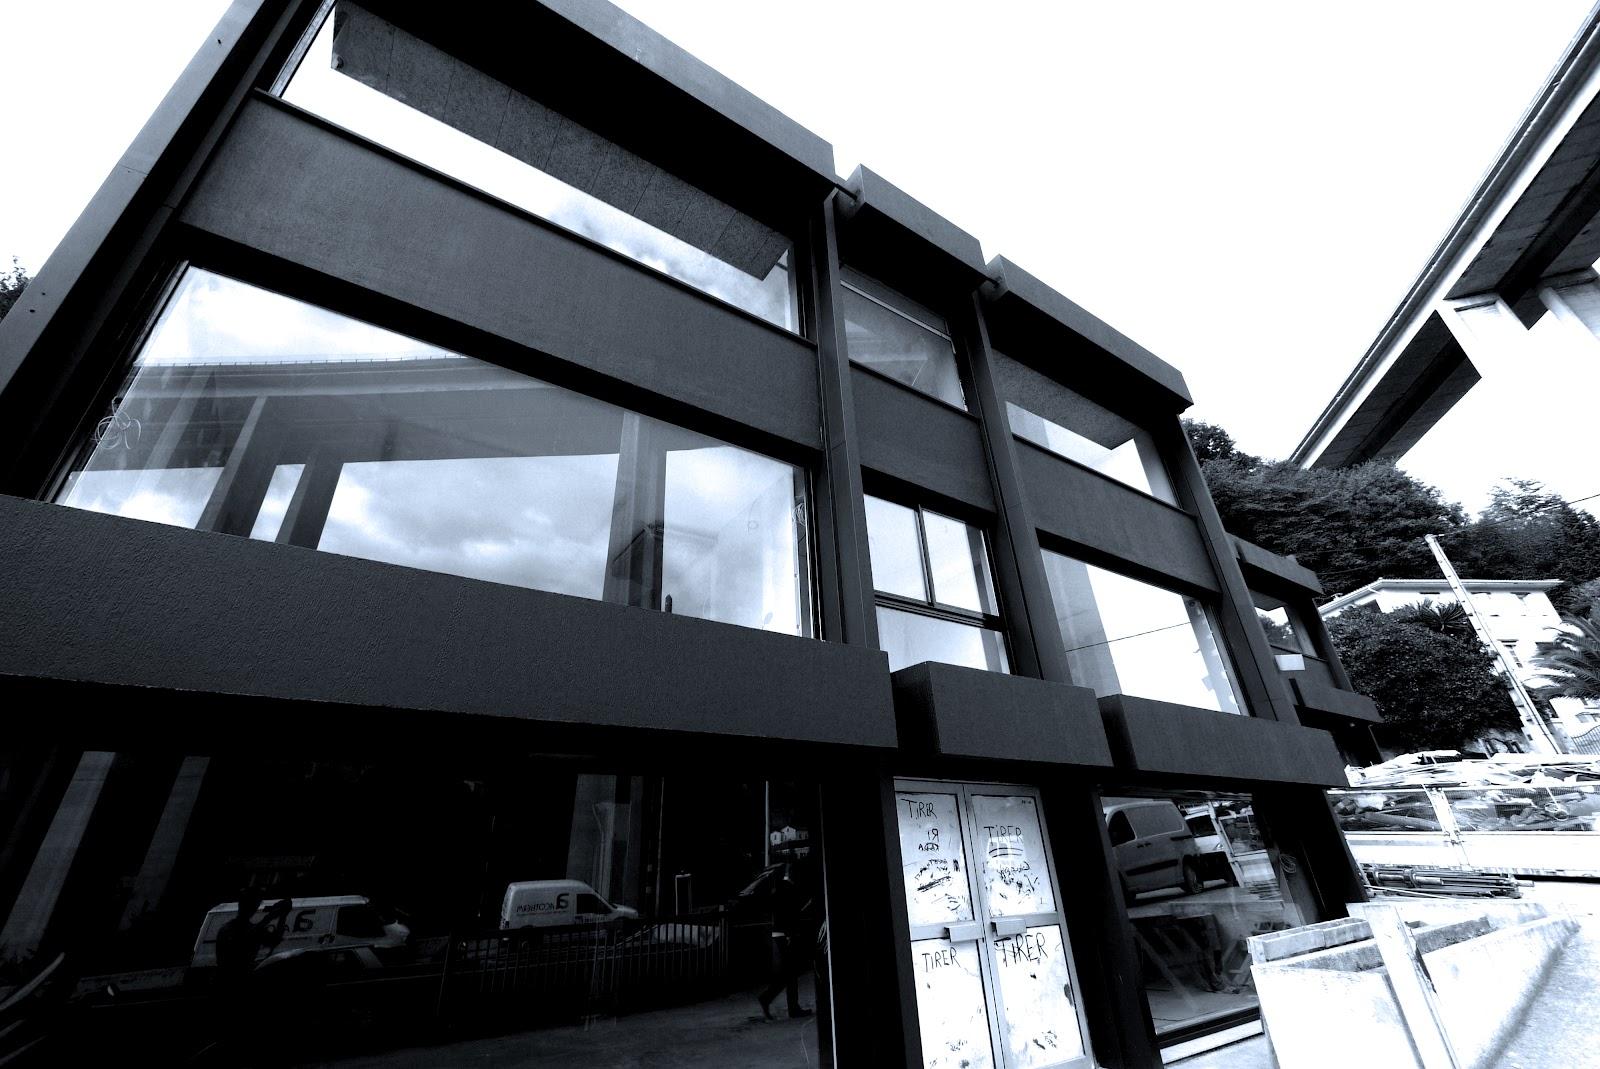 le blog de l 39 agence avantgarde design retail design et design de lieux avril 2012. Black Bedroom Furniture Sets. Home Design Ideas